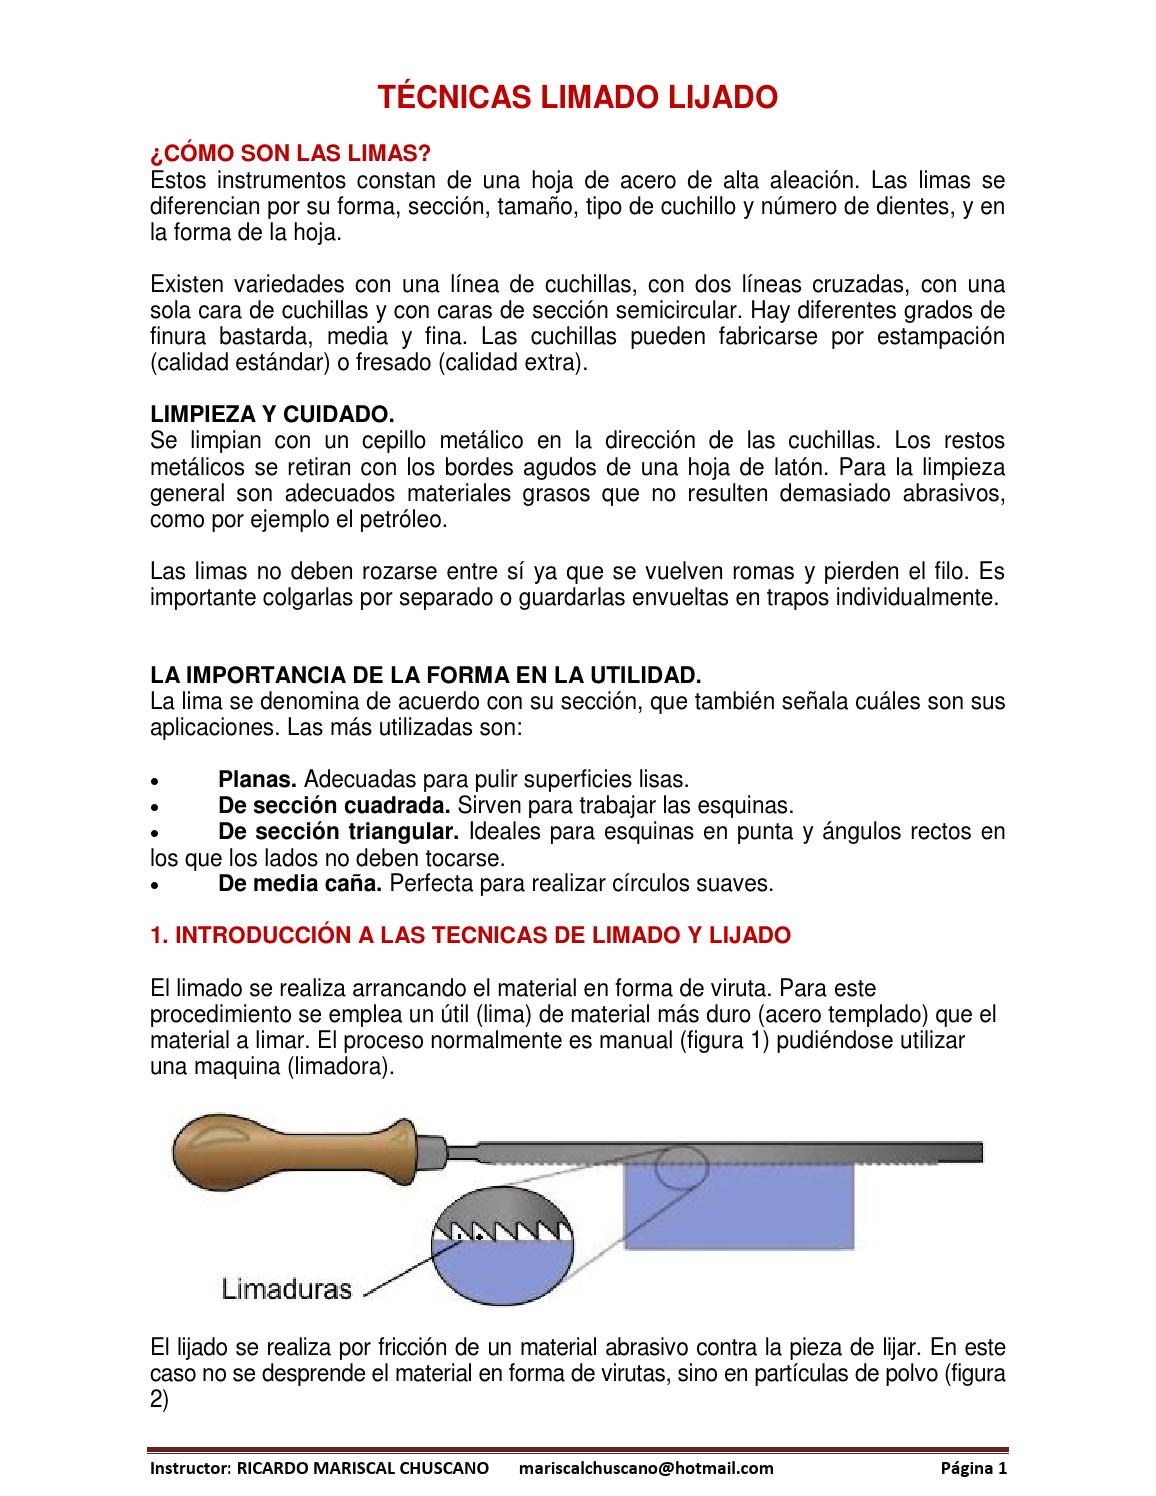 02 técnicas limado lijado by Ricardo Mariscal - issuu